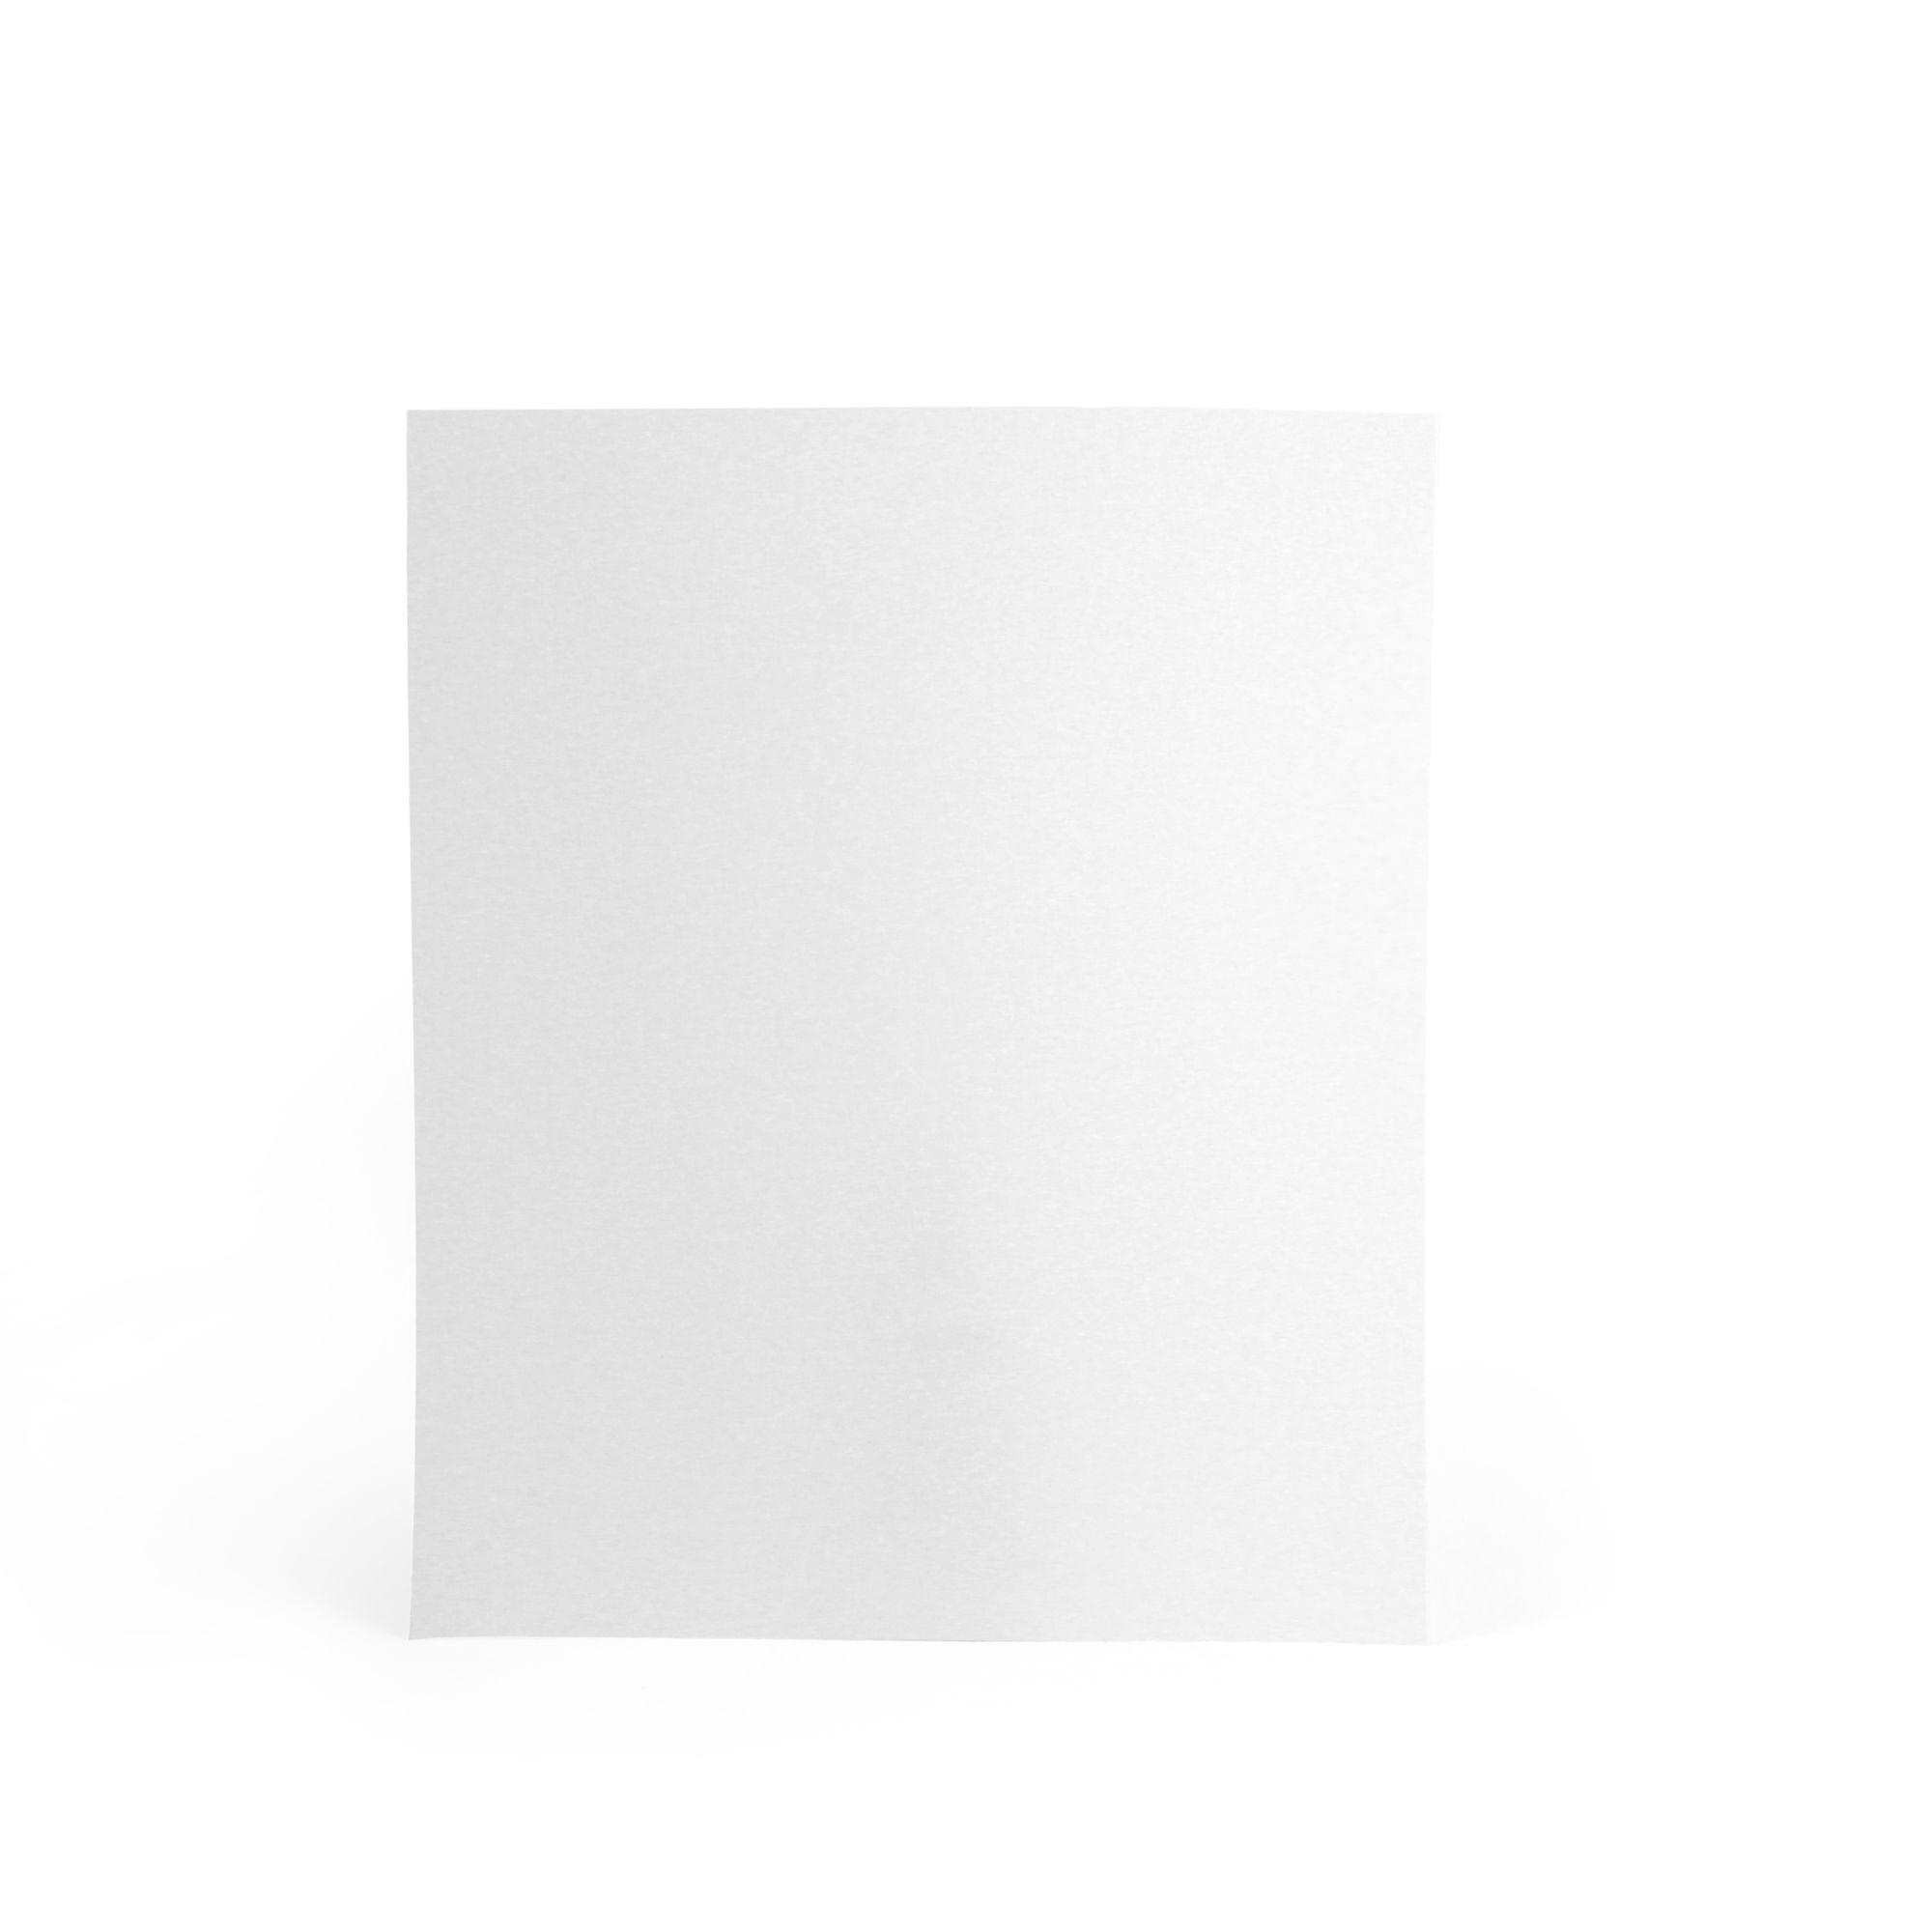 briefpapier rivoli 120g carta pura formost. Black Bedroom Furniture Sets. Home Design Ideas